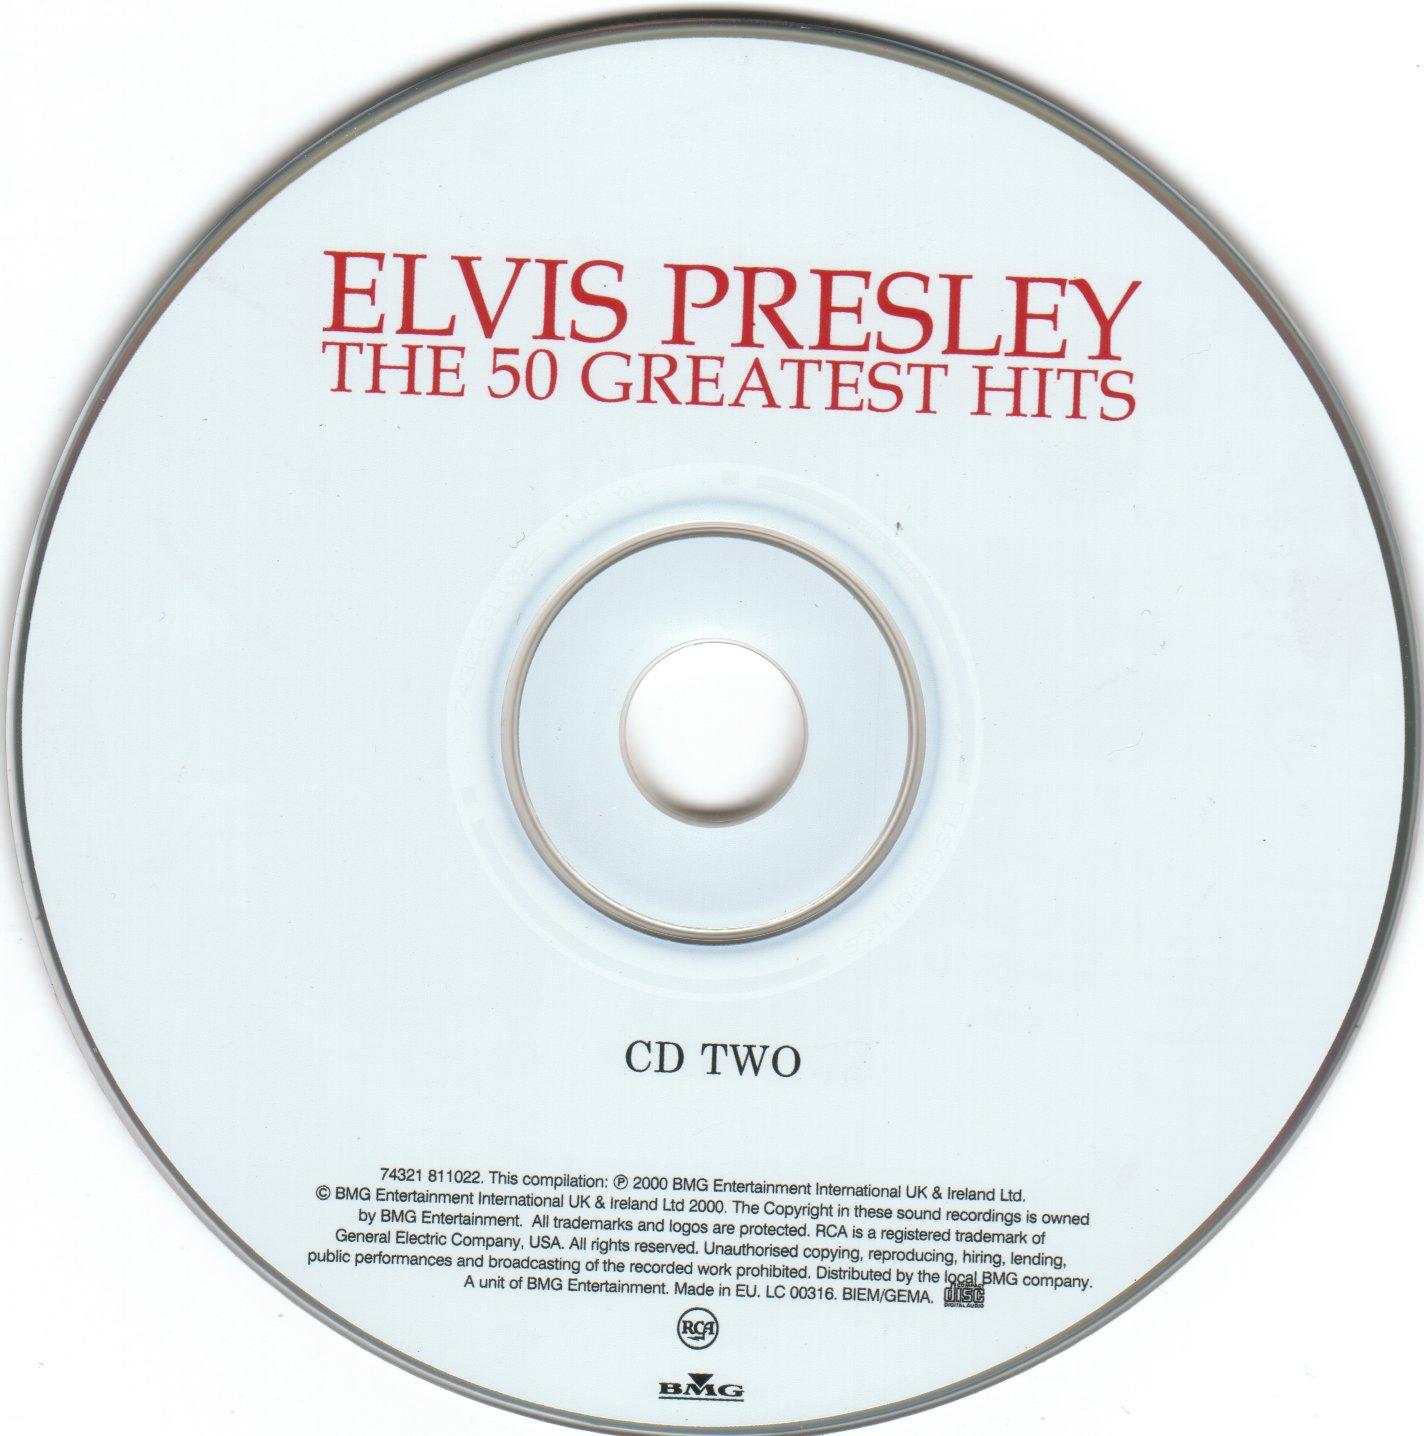 u2 greatest hits album